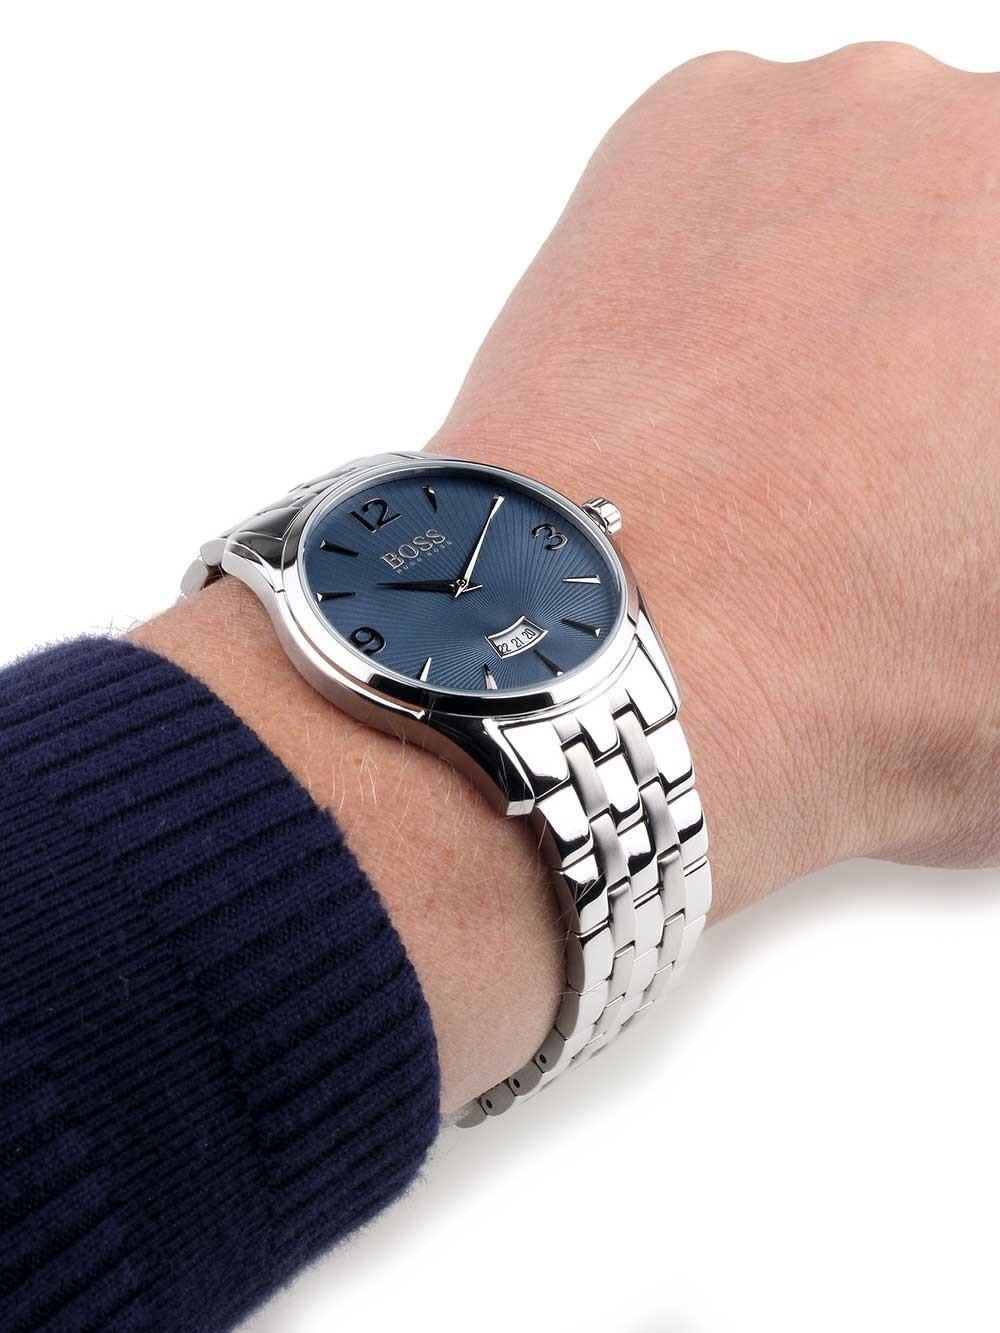 watches chrono12 hugo boss 1513428 commander herren. Black Bedroom Furniture Sets. Home Design Ideas